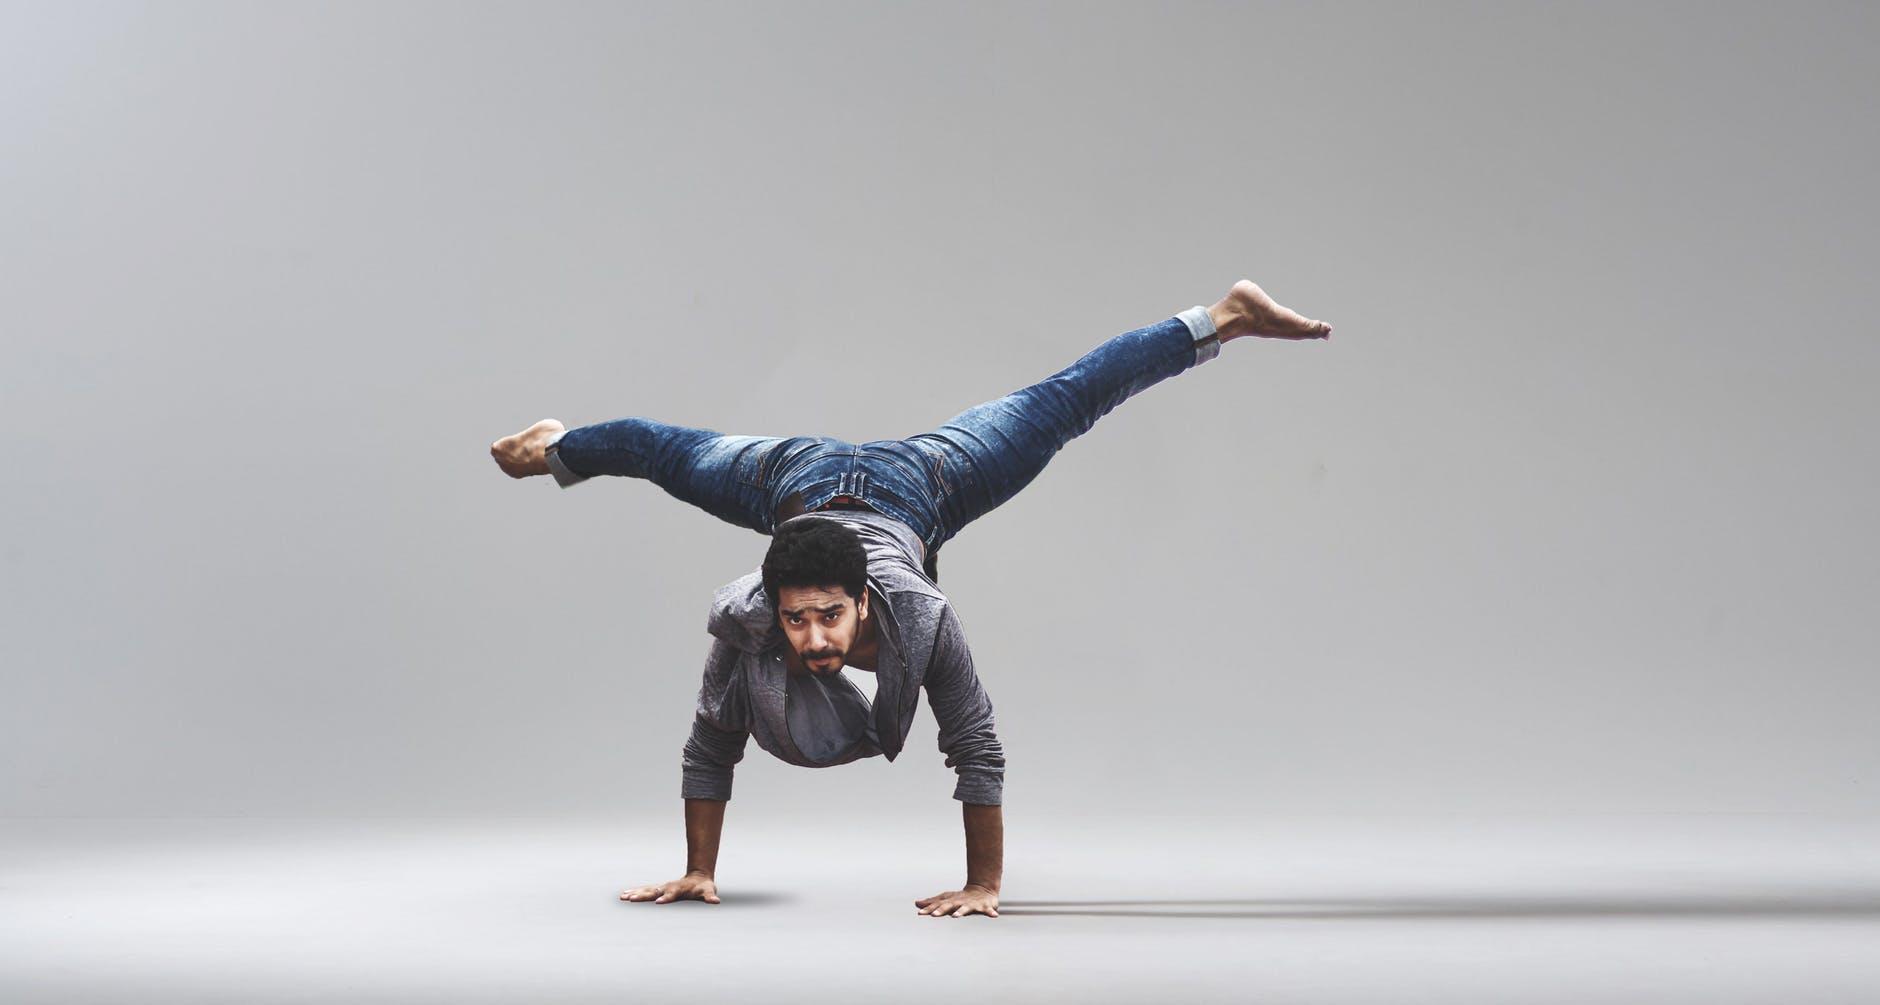 man performing handstand